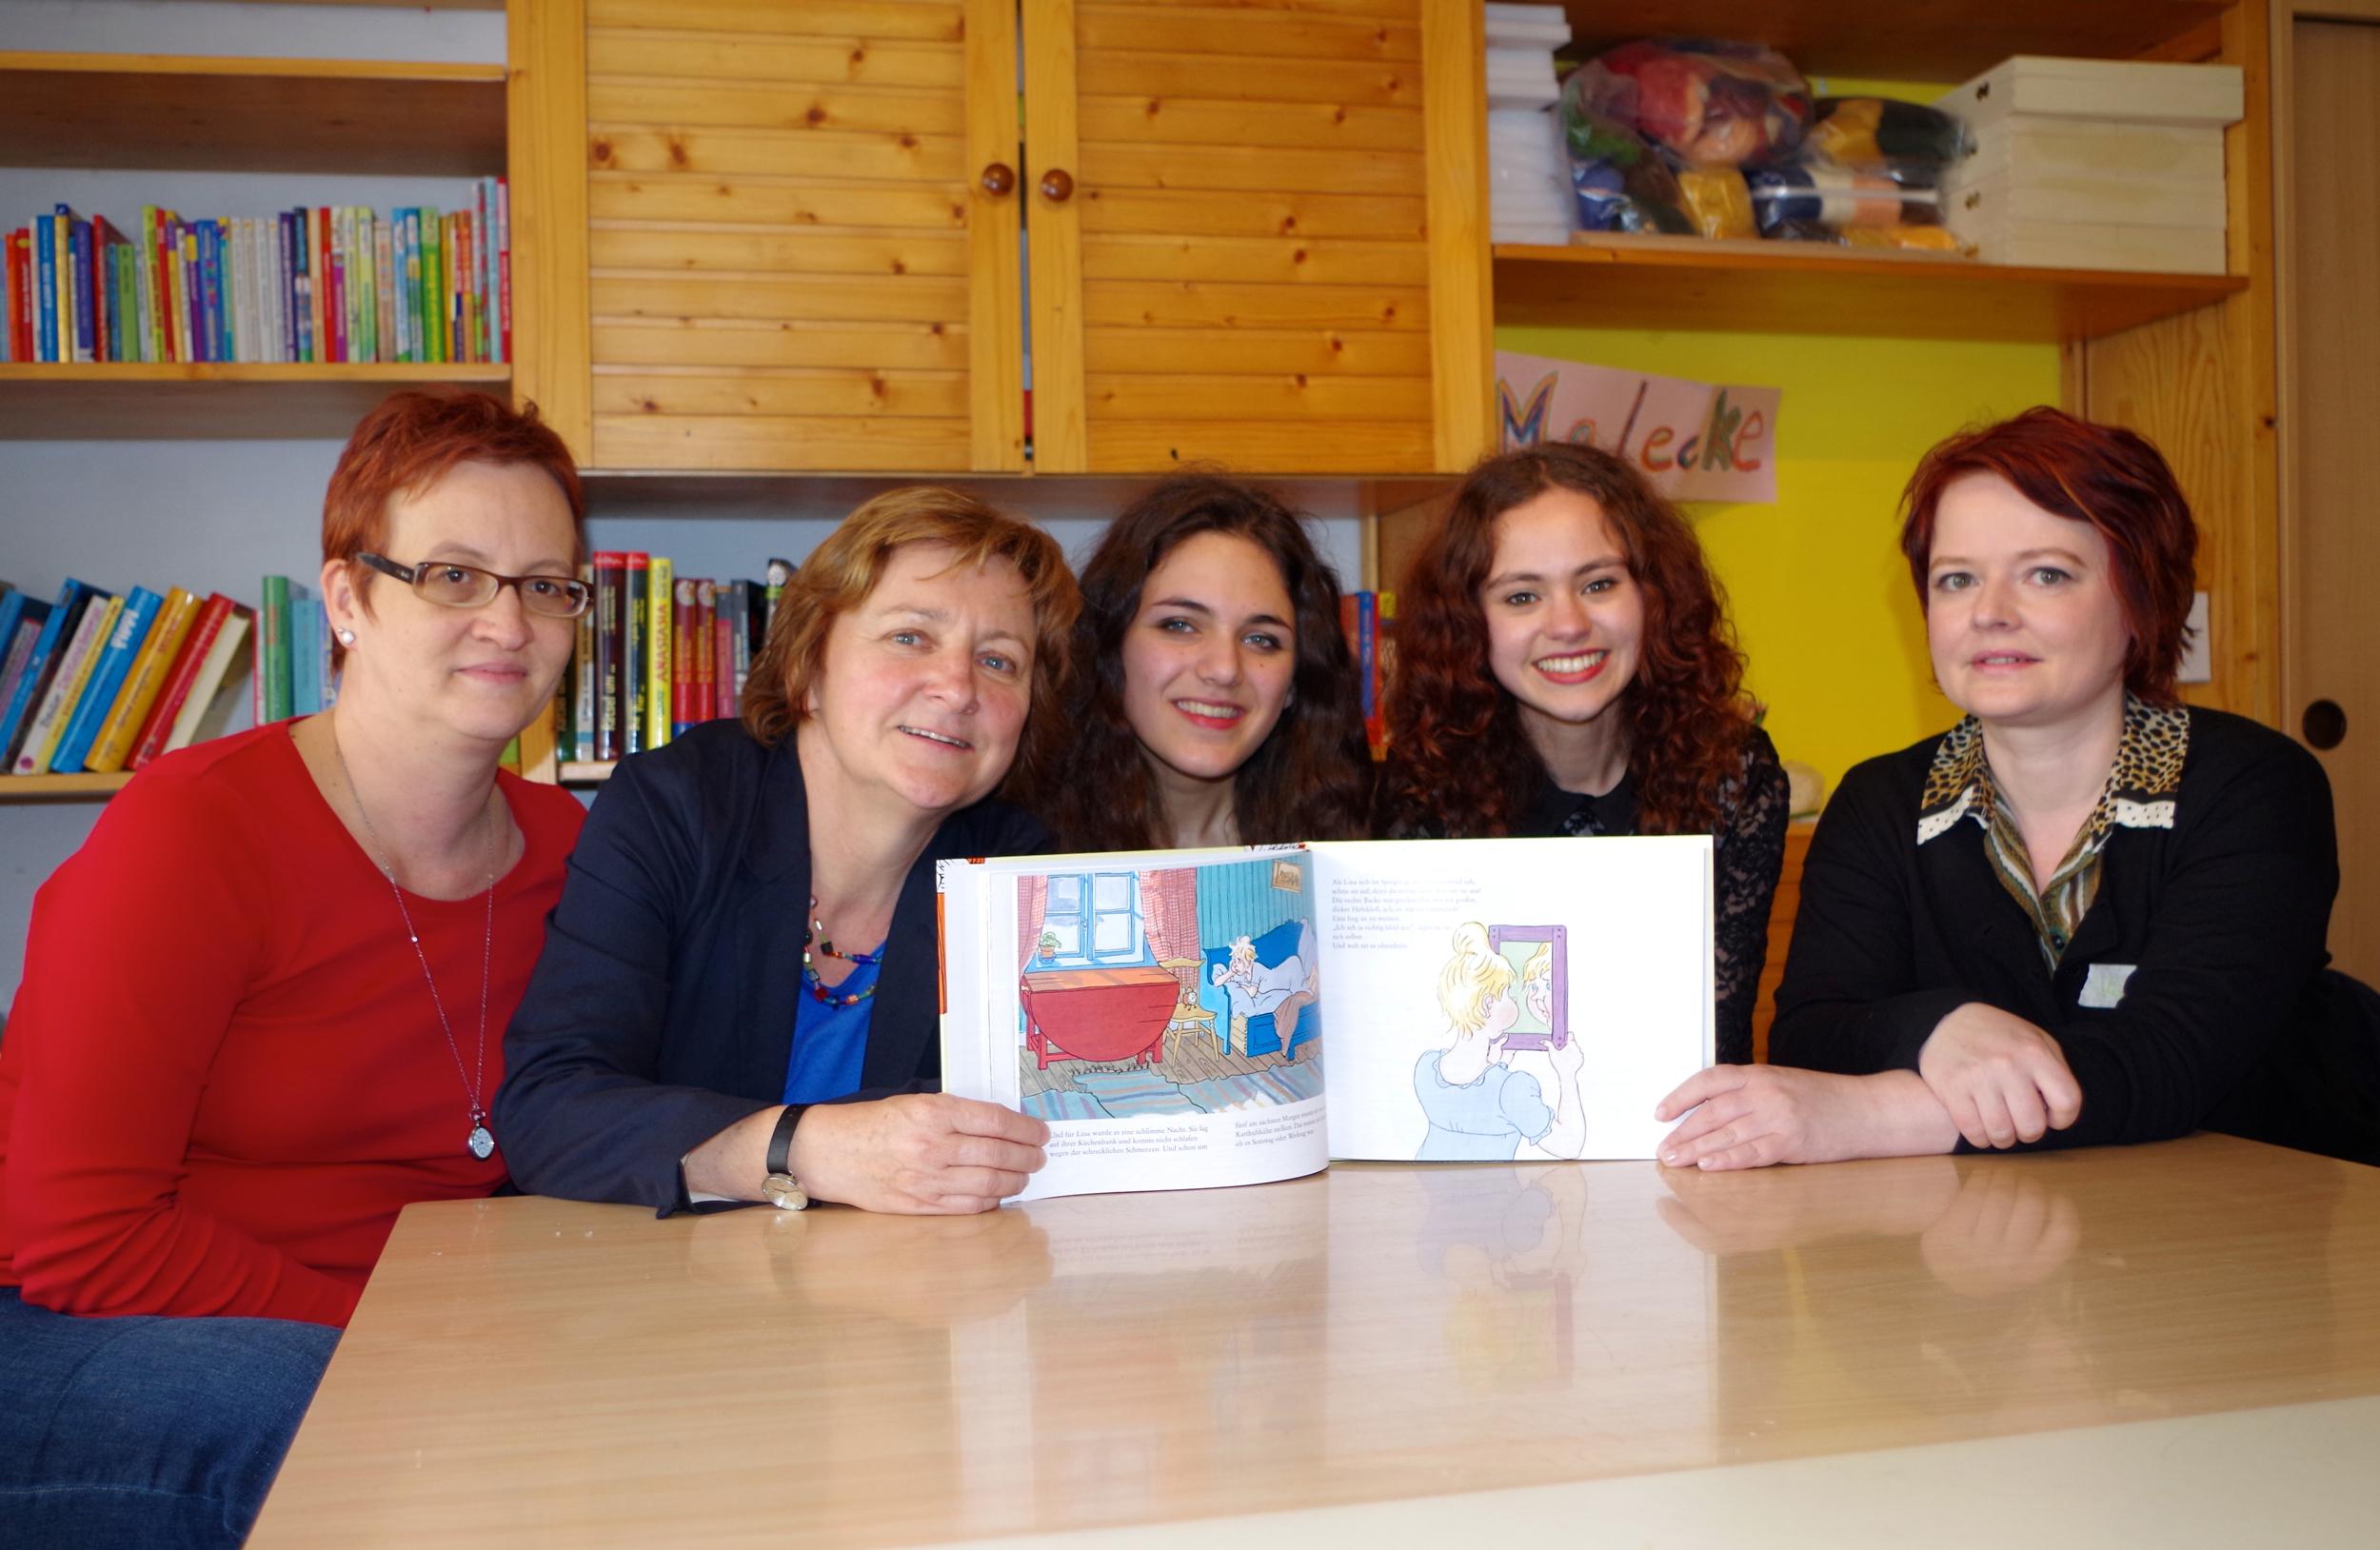 v.l.n.r.: Bianca Großkreutz, Elke Dörr, Sarah Al-Tabatabaee, Dunja Hayek, Verena Osgyan